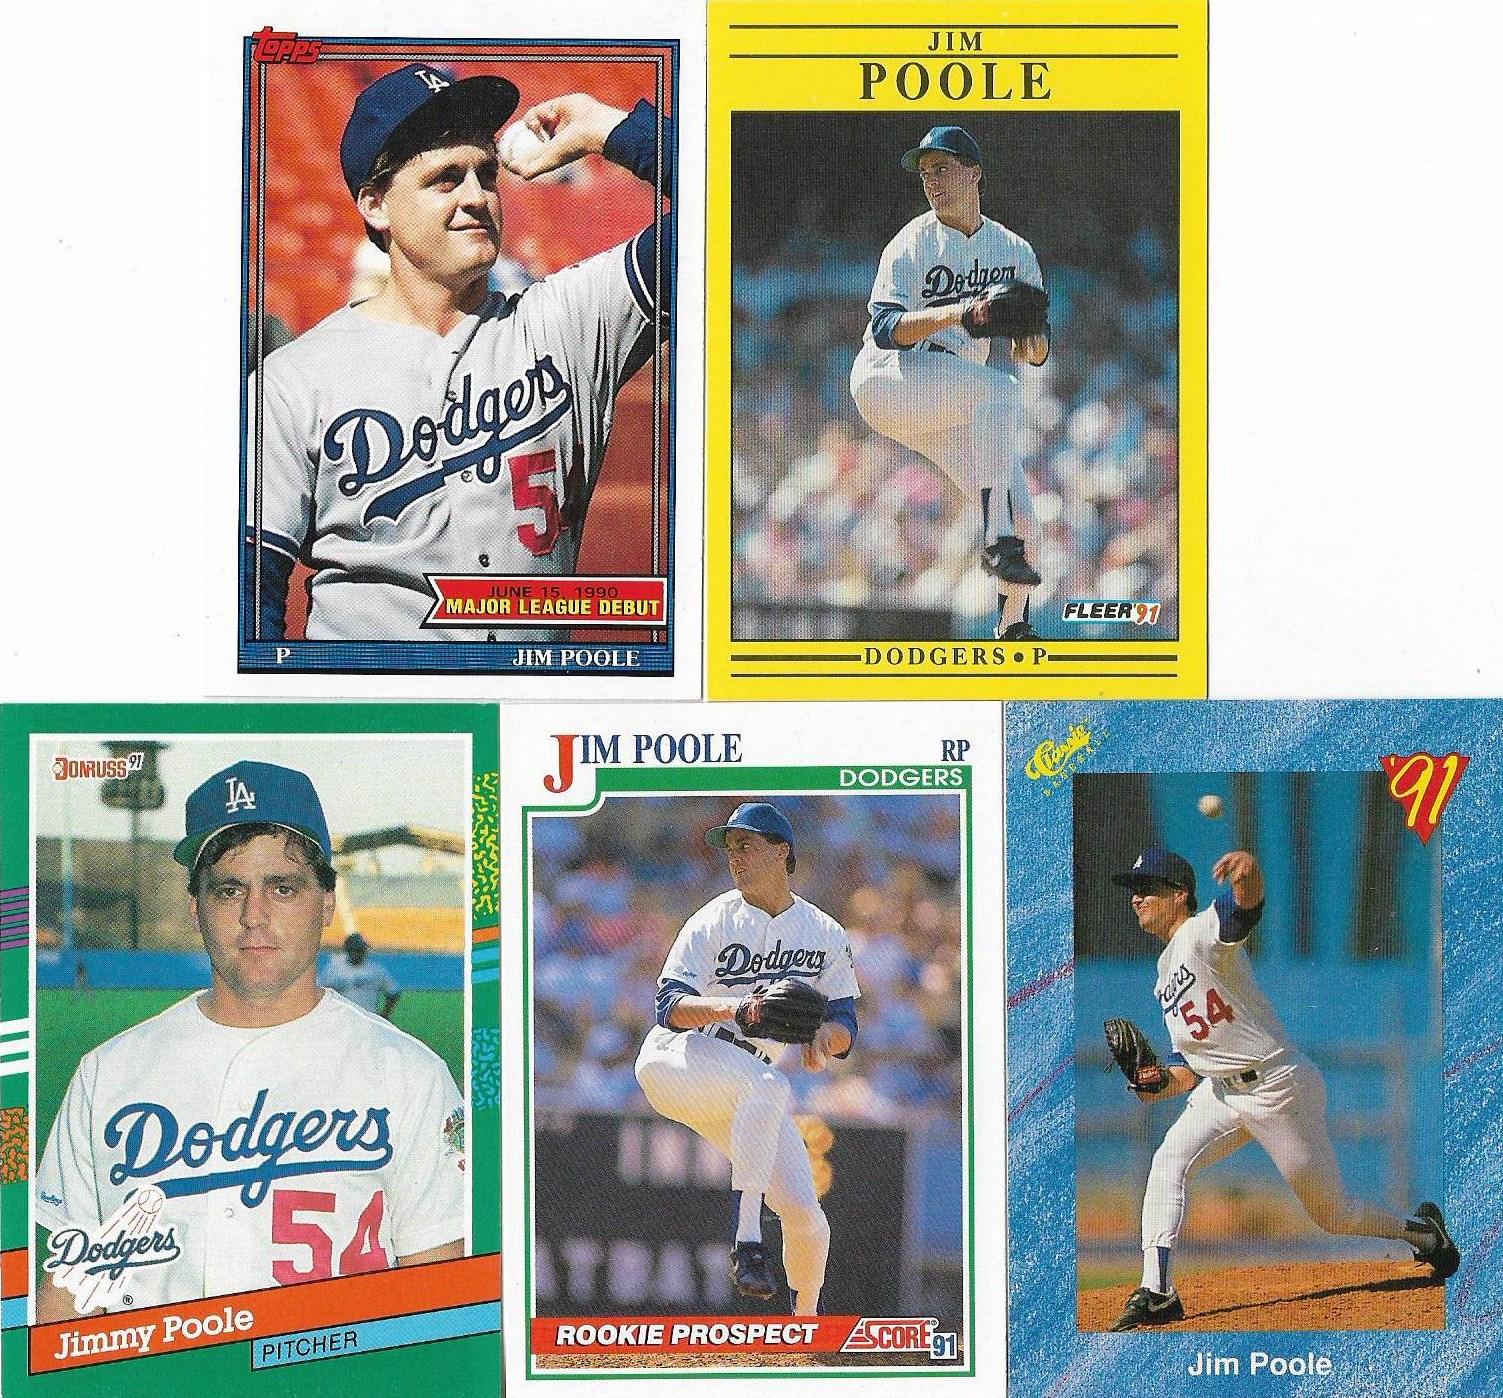 Night Owl Cards: C.A.: 1989 Topps Big Baseball Jim Poole